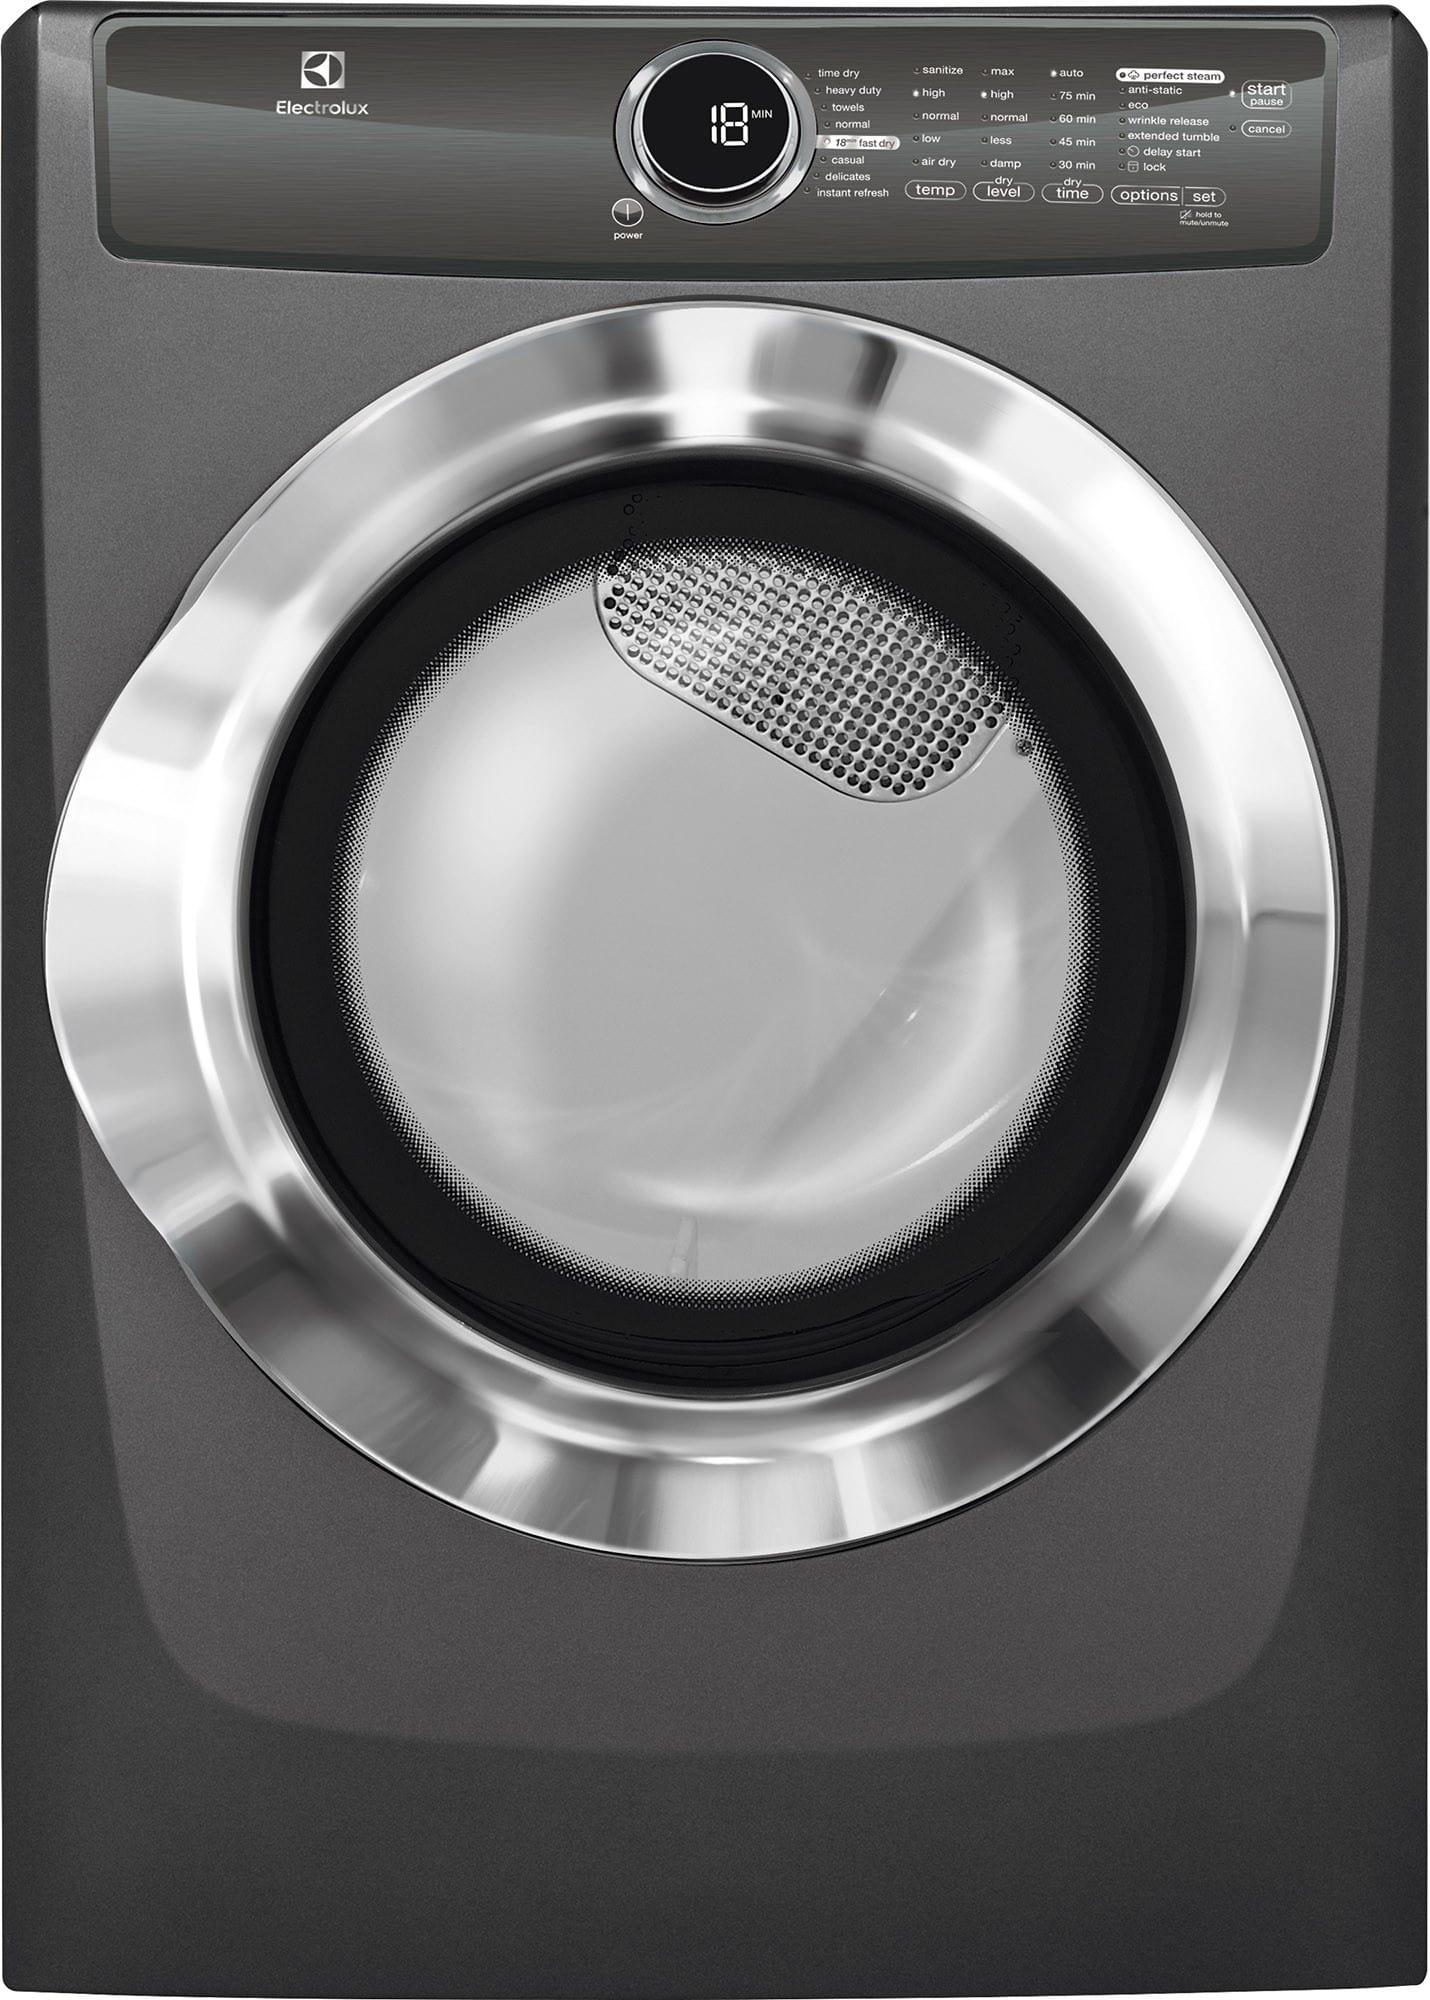 drawer product white jsp w prod op sharpen d hei details electrolux laundry pedestal wid